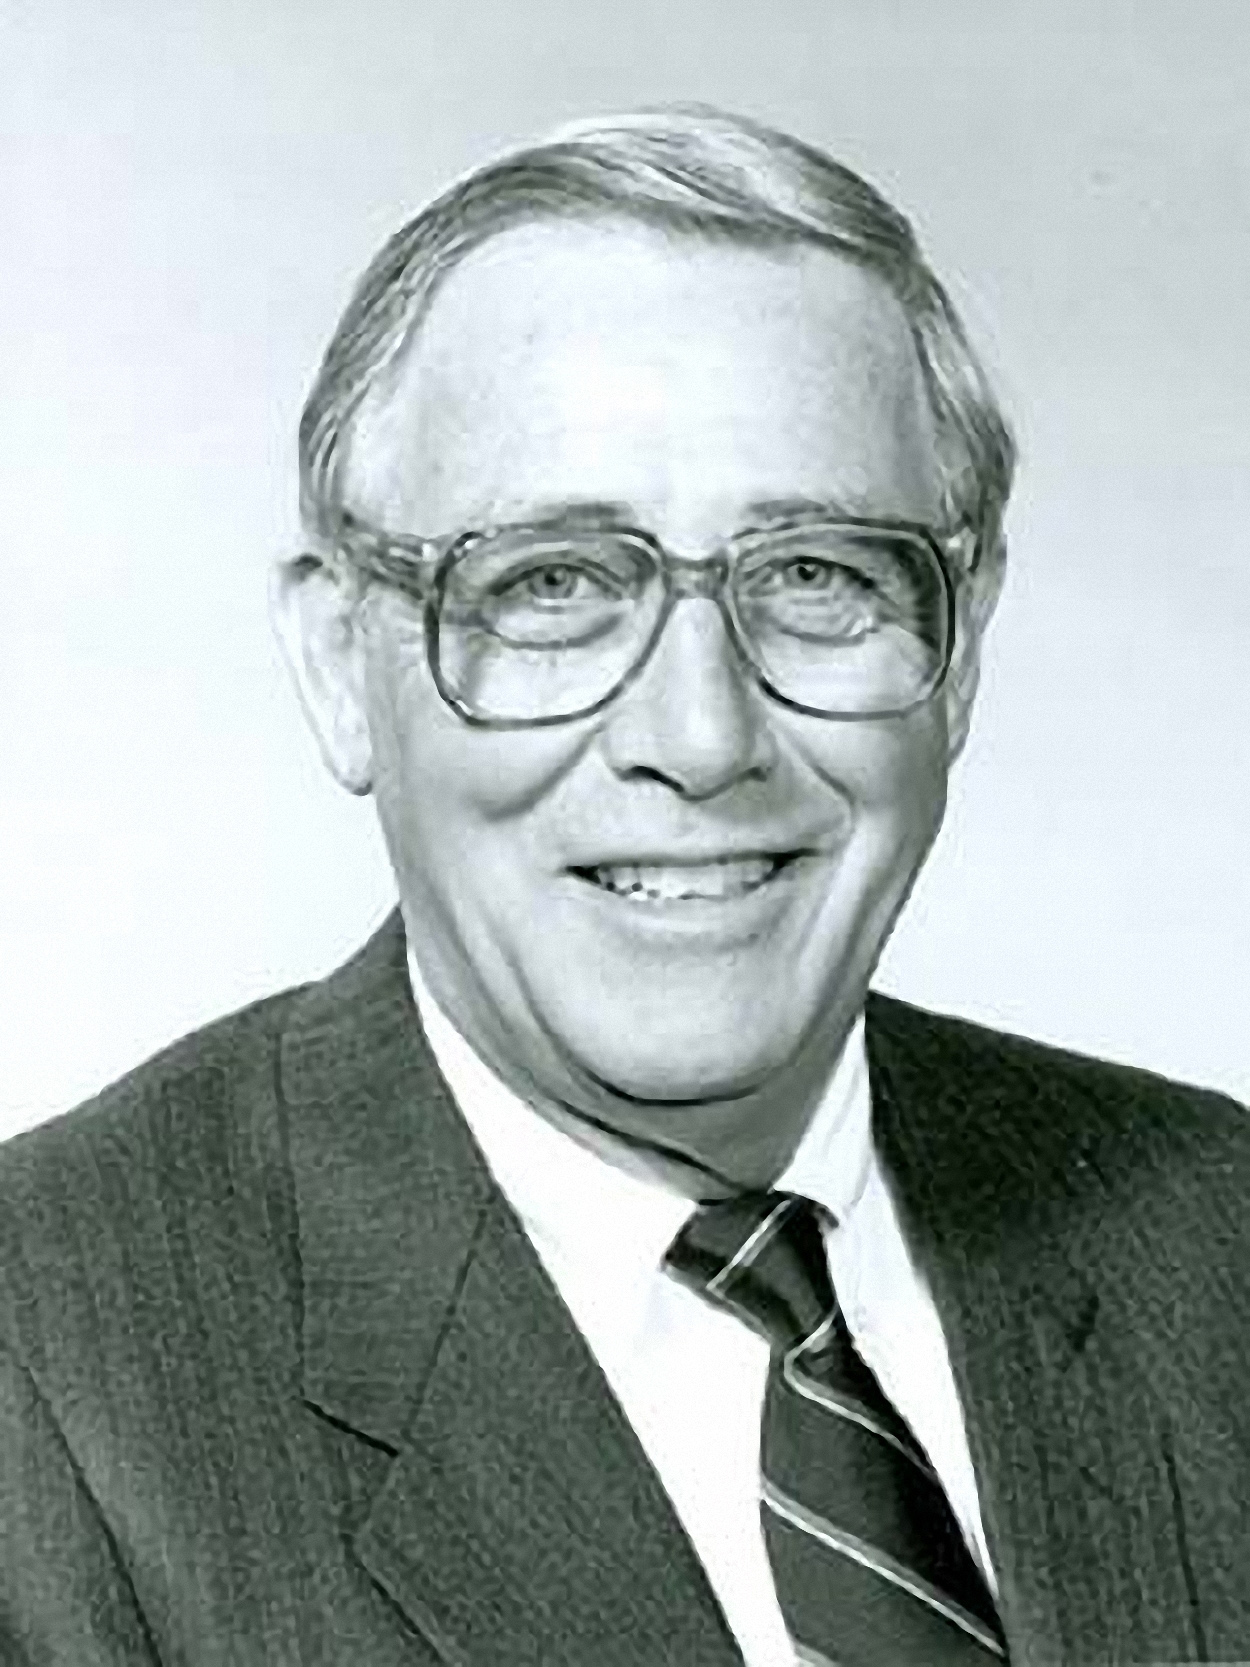 Jack Breslin salary